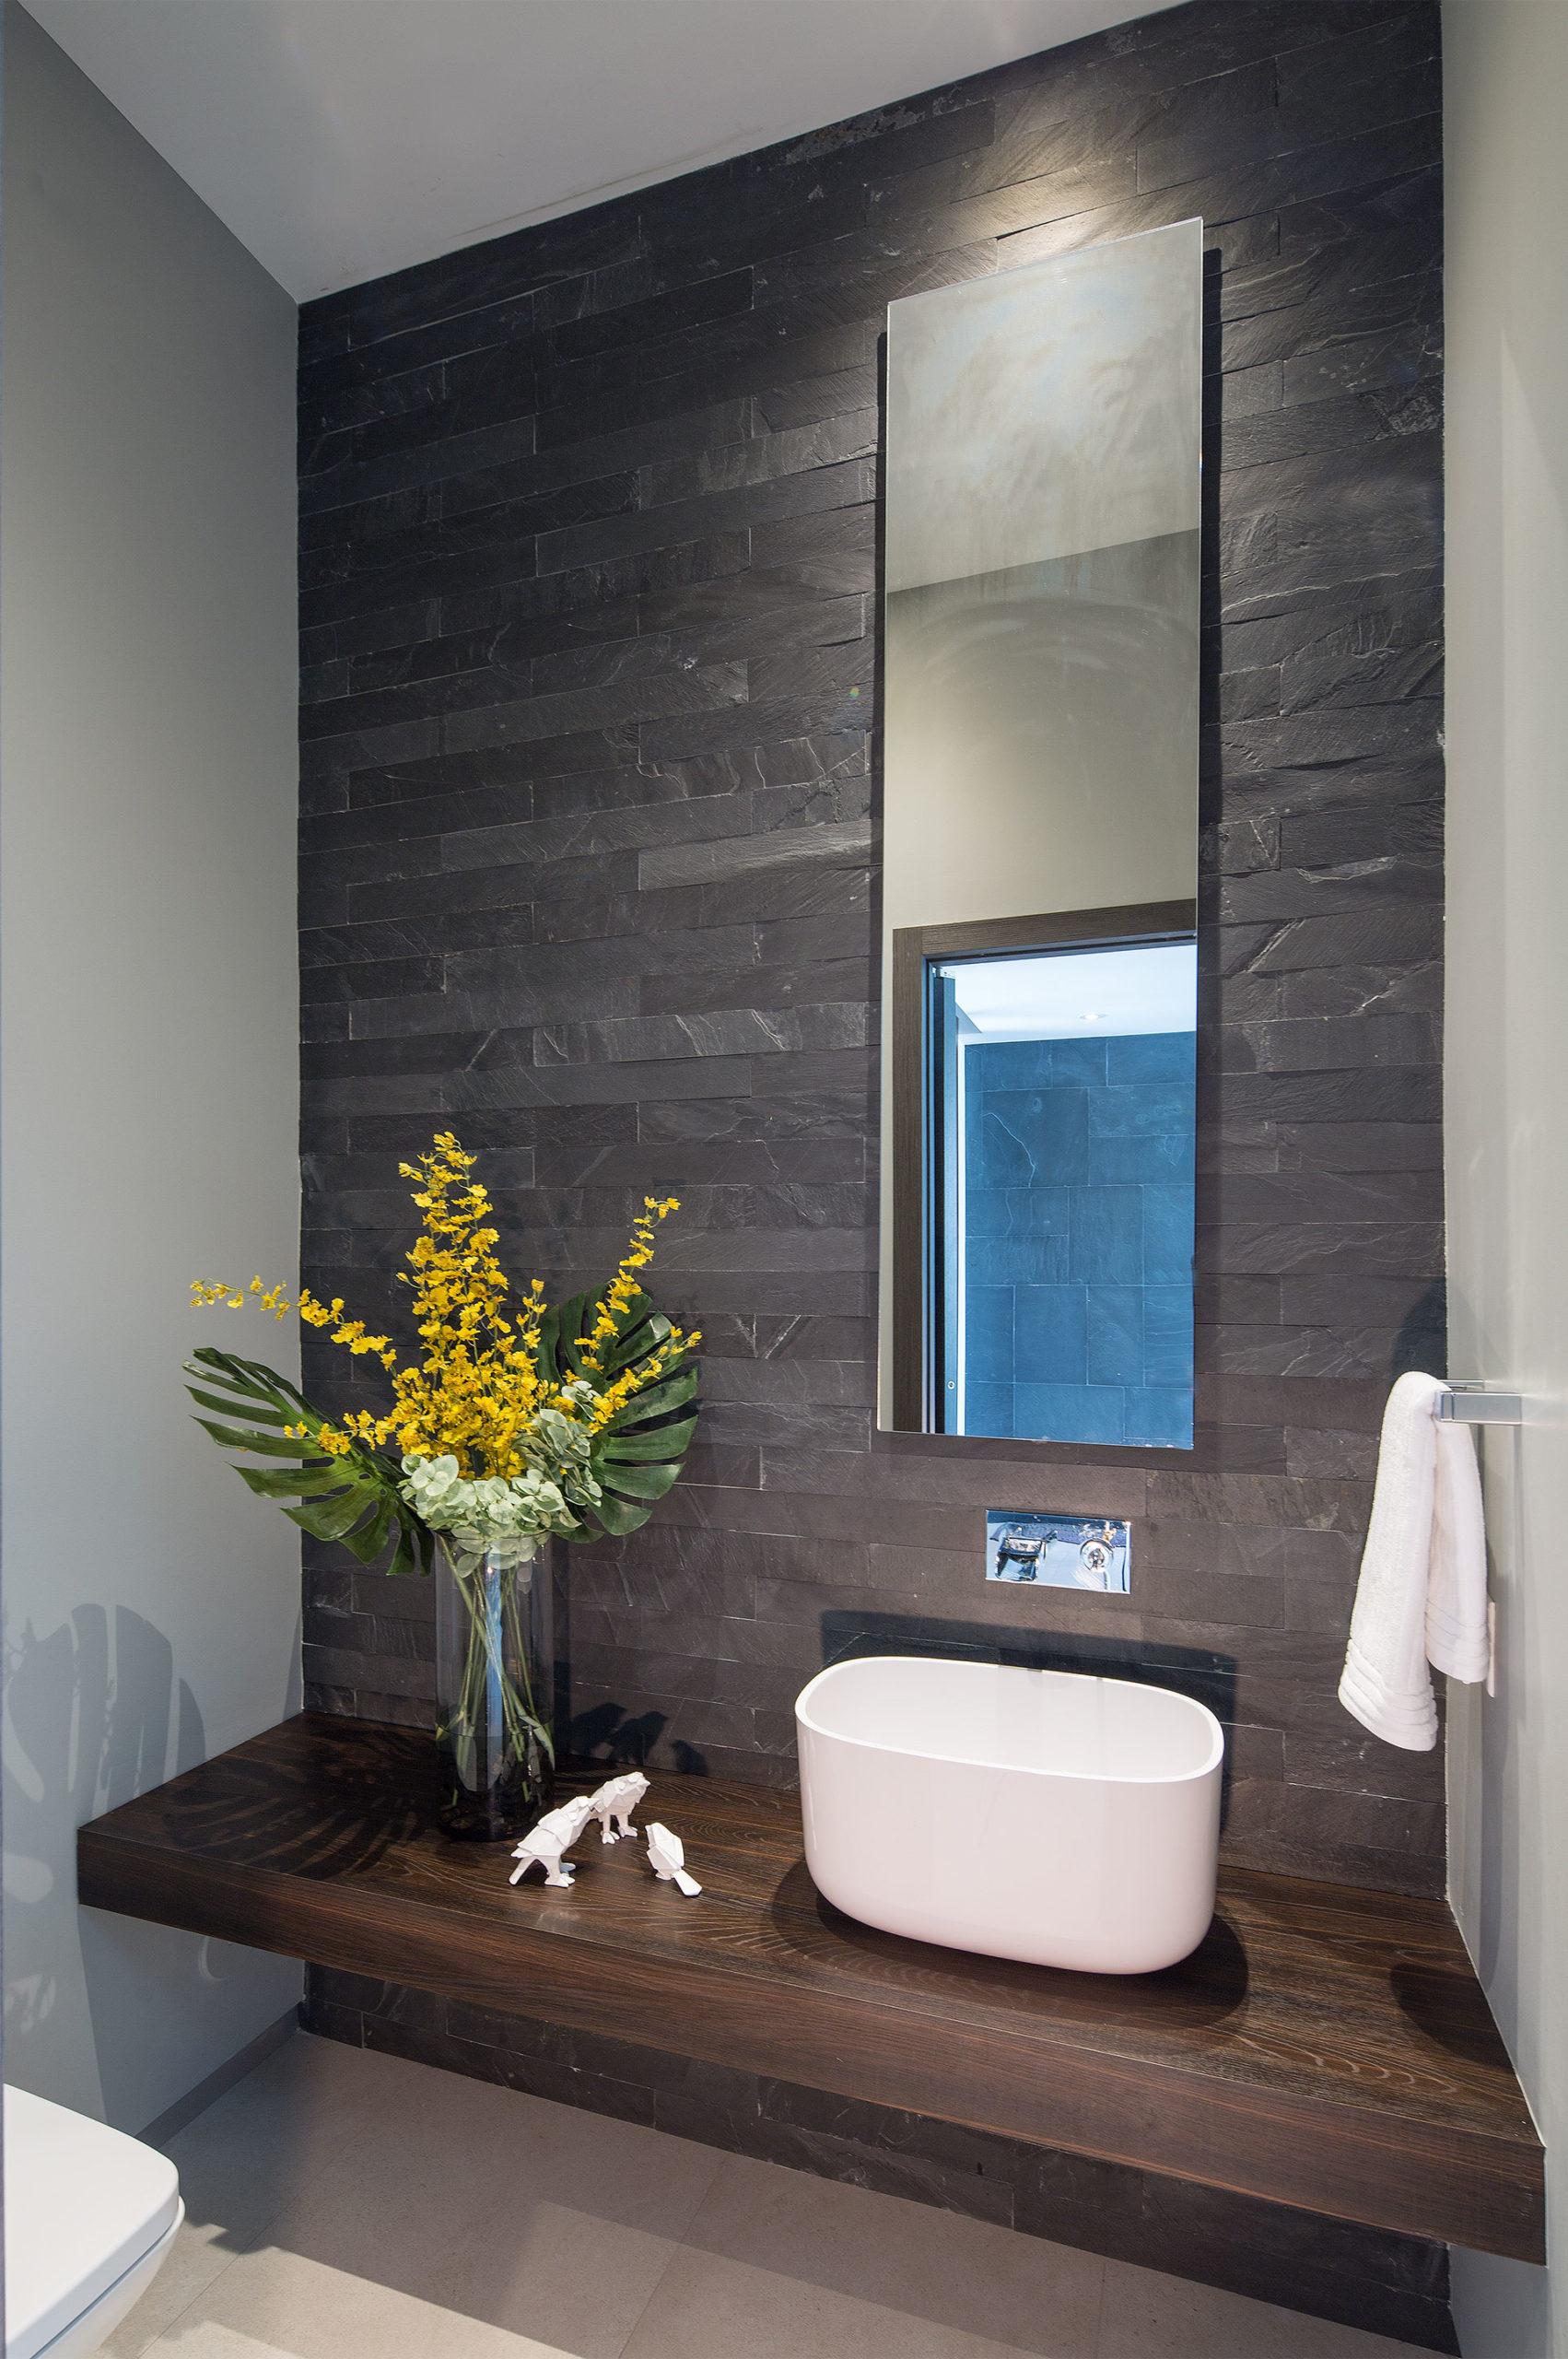 Interior Design bathroom view project in 475 Center Island Drive, Florida